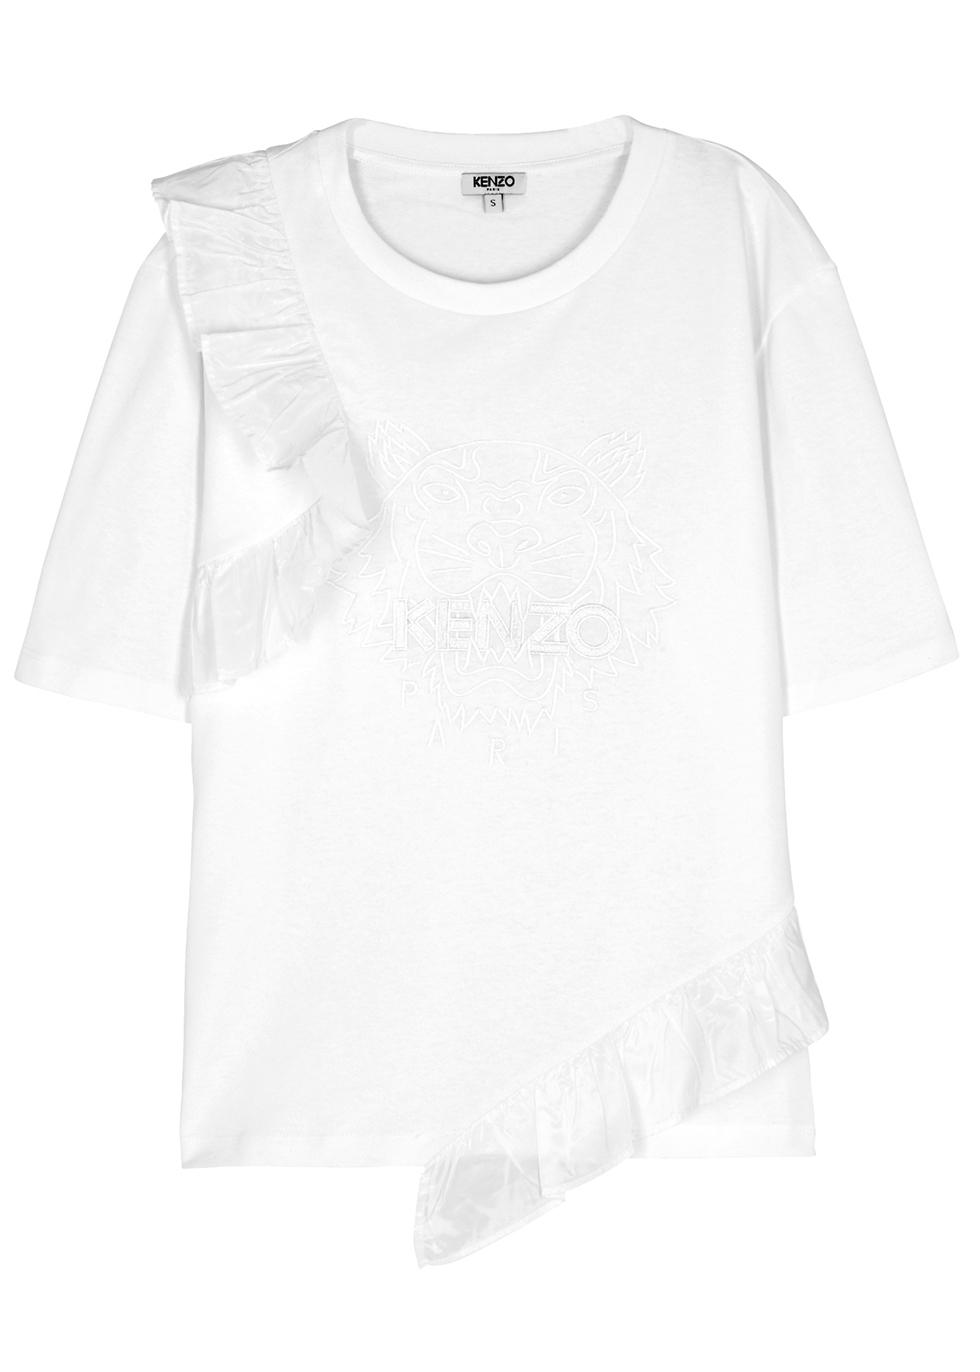 d9e53c82 Kenzo - Designer Sweatshirts, T-Shirts, Bags - Harvey Nichols